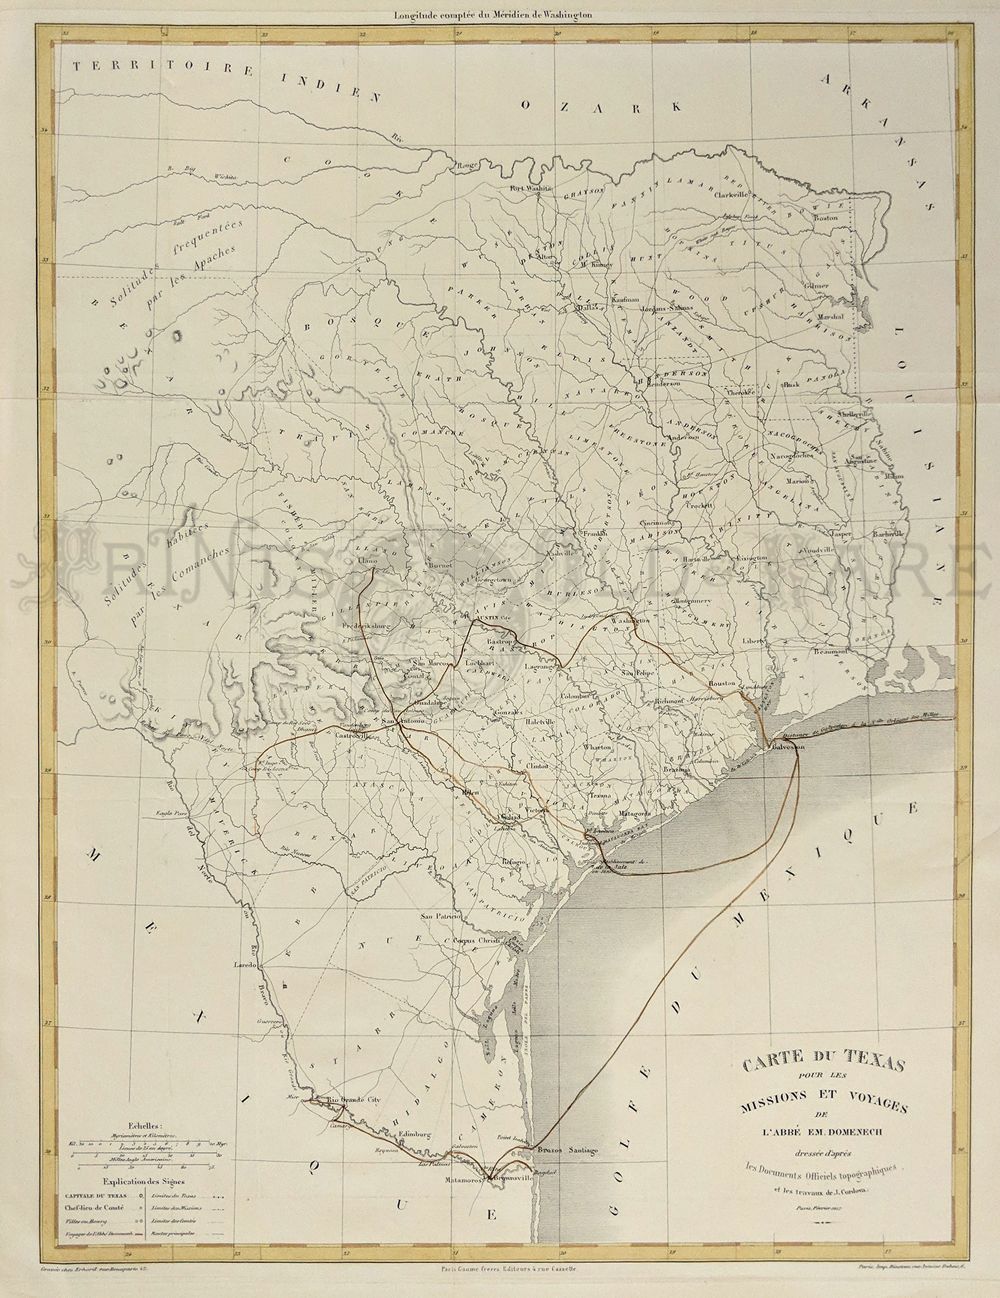 Prints Old & Rare - Texas - Antique Maps & Prints - Vintage Texas Map Framed